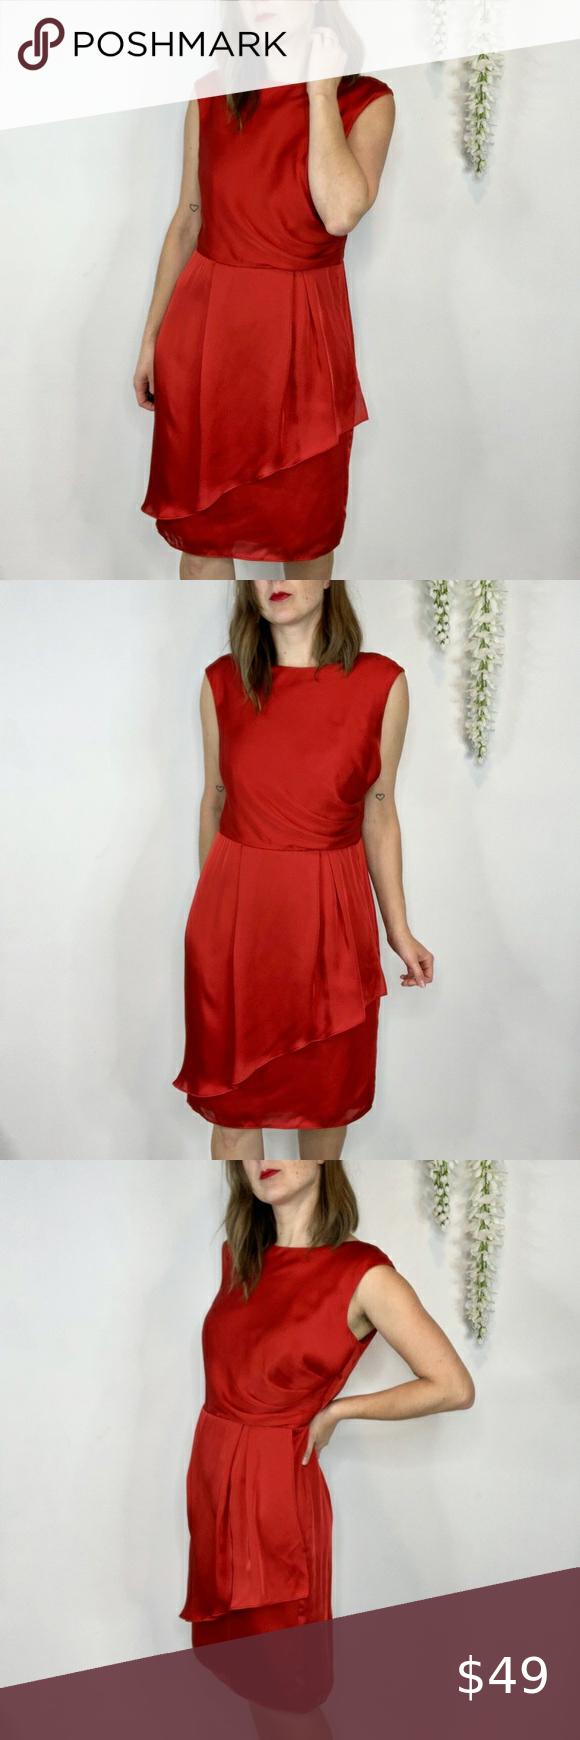 Vince Camuto Satin Red Dress Draped Skirt 1461 Red Satin Dress Lace White Dress Long Sleeve Knit Dress [ 1740 x 580 Pixel ]